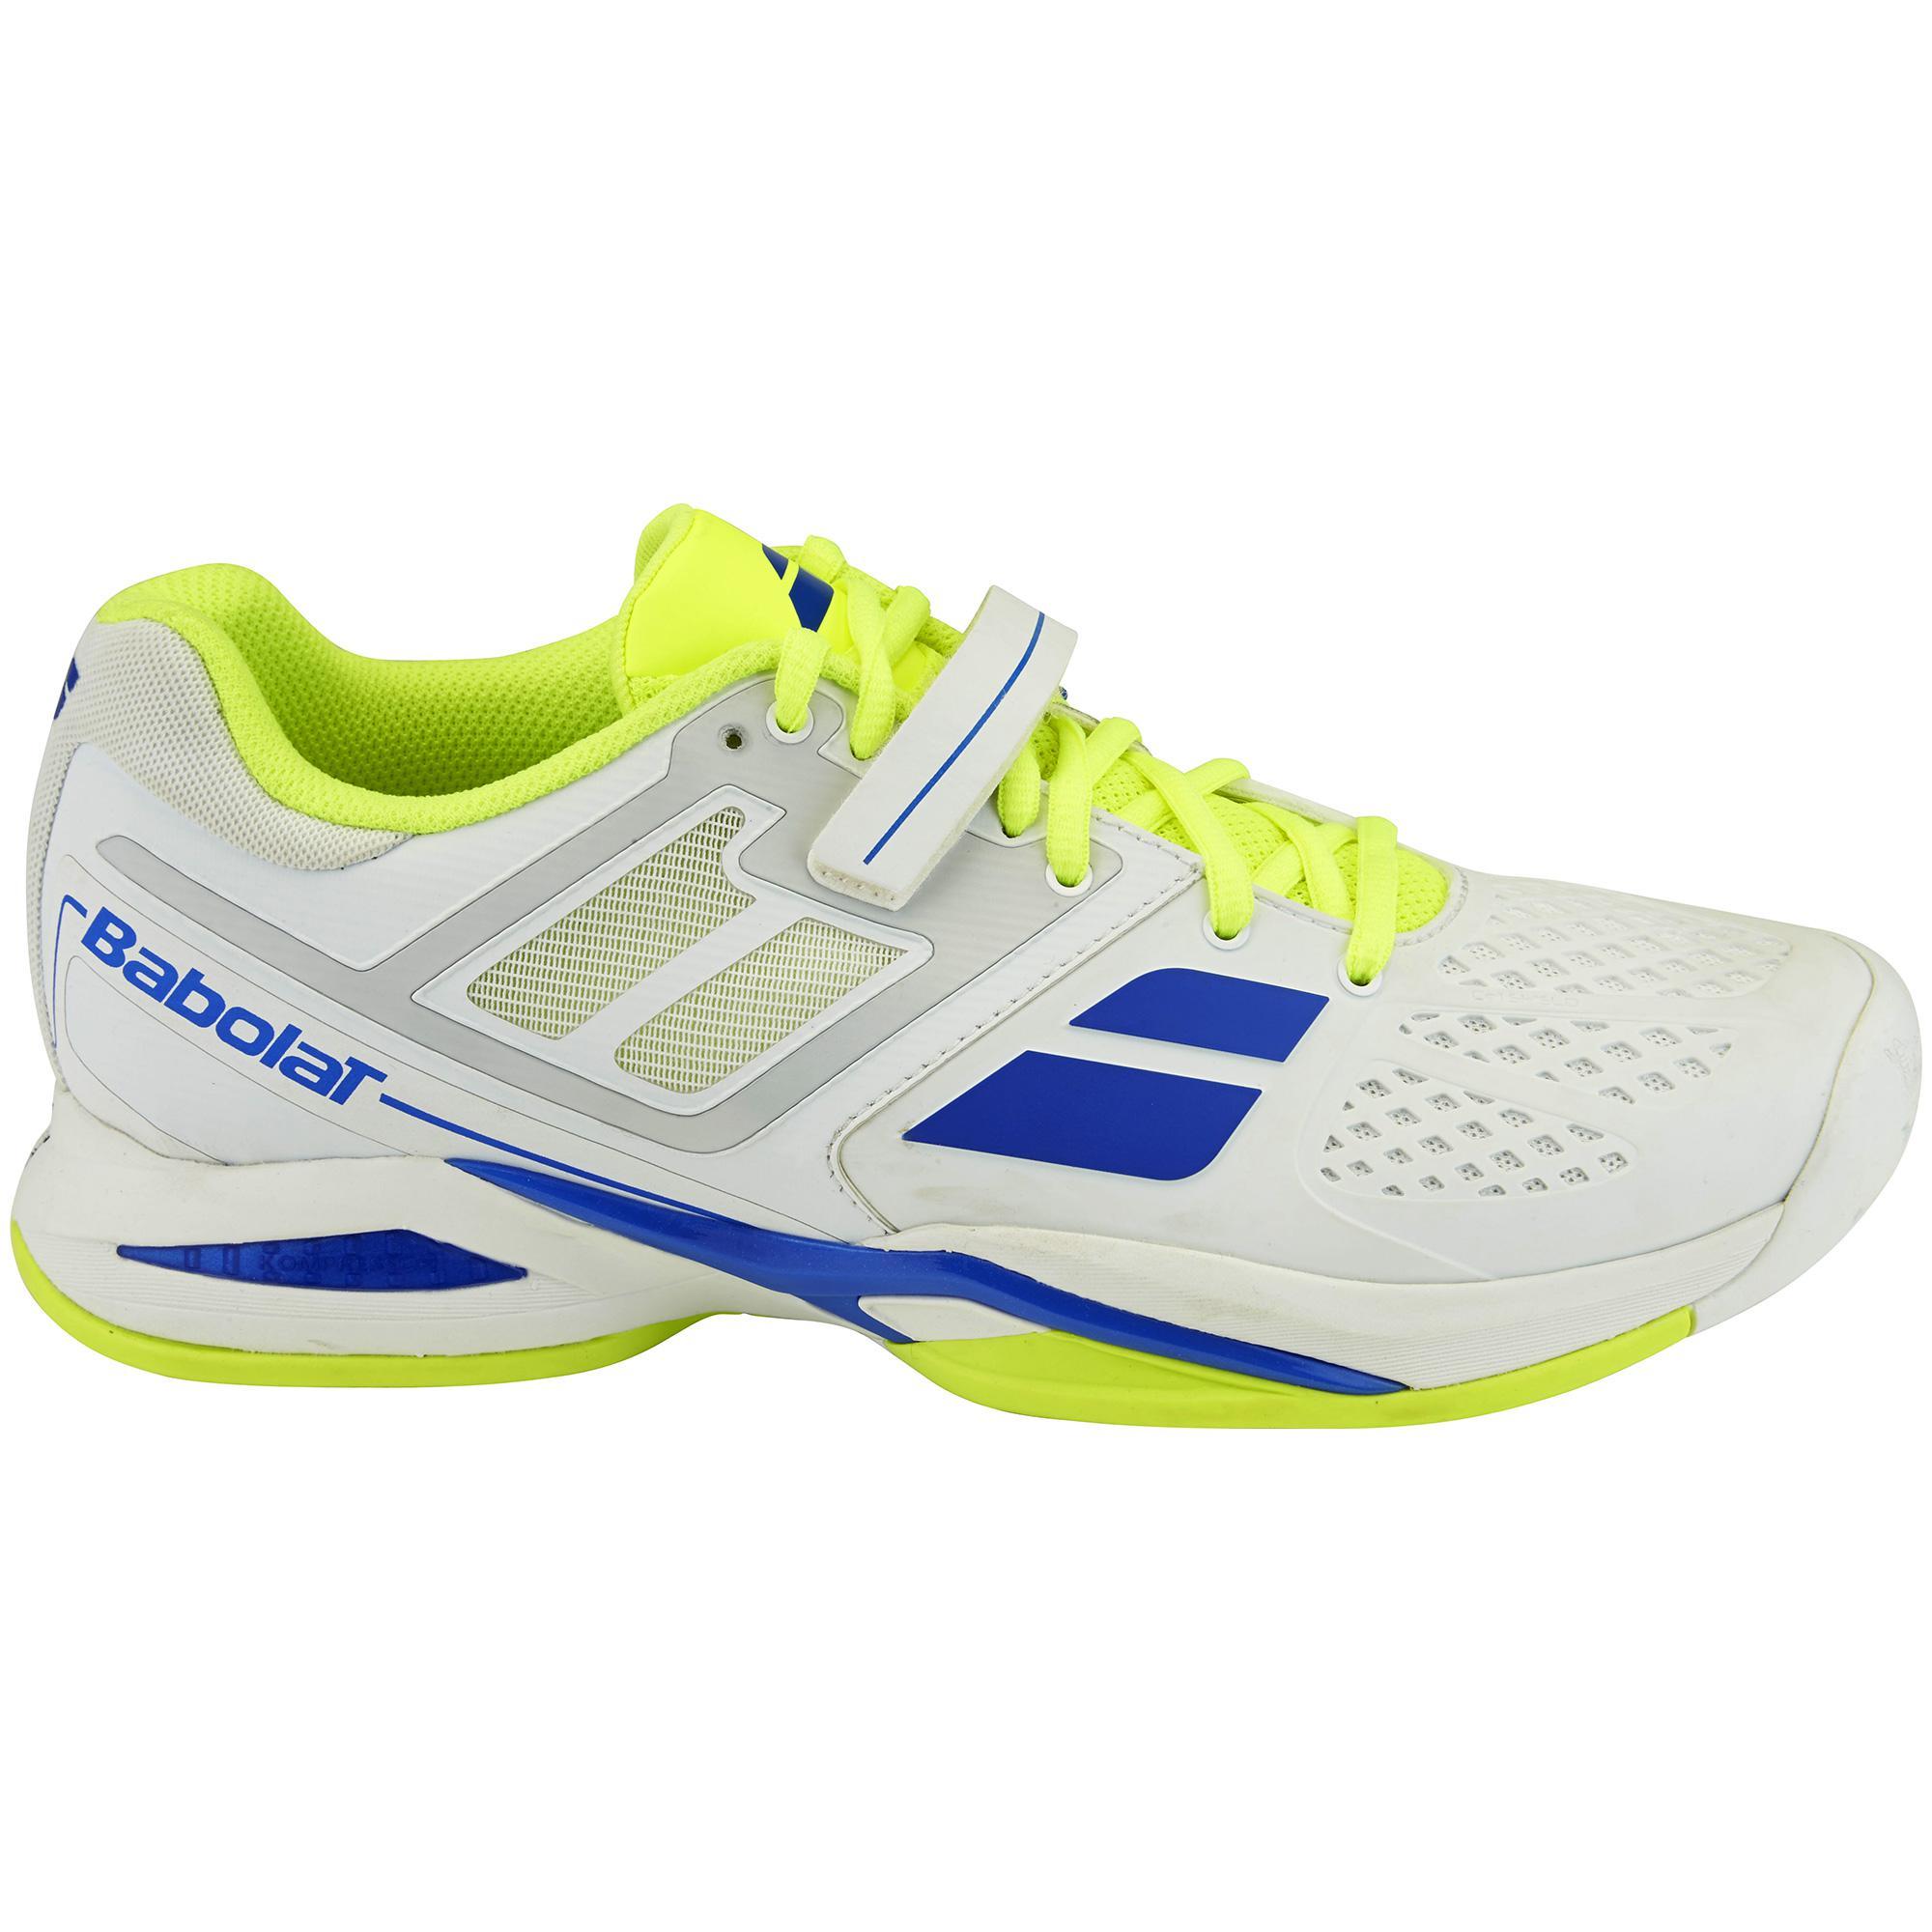 Babolat Mens Propulse All Court Tennis Shoes